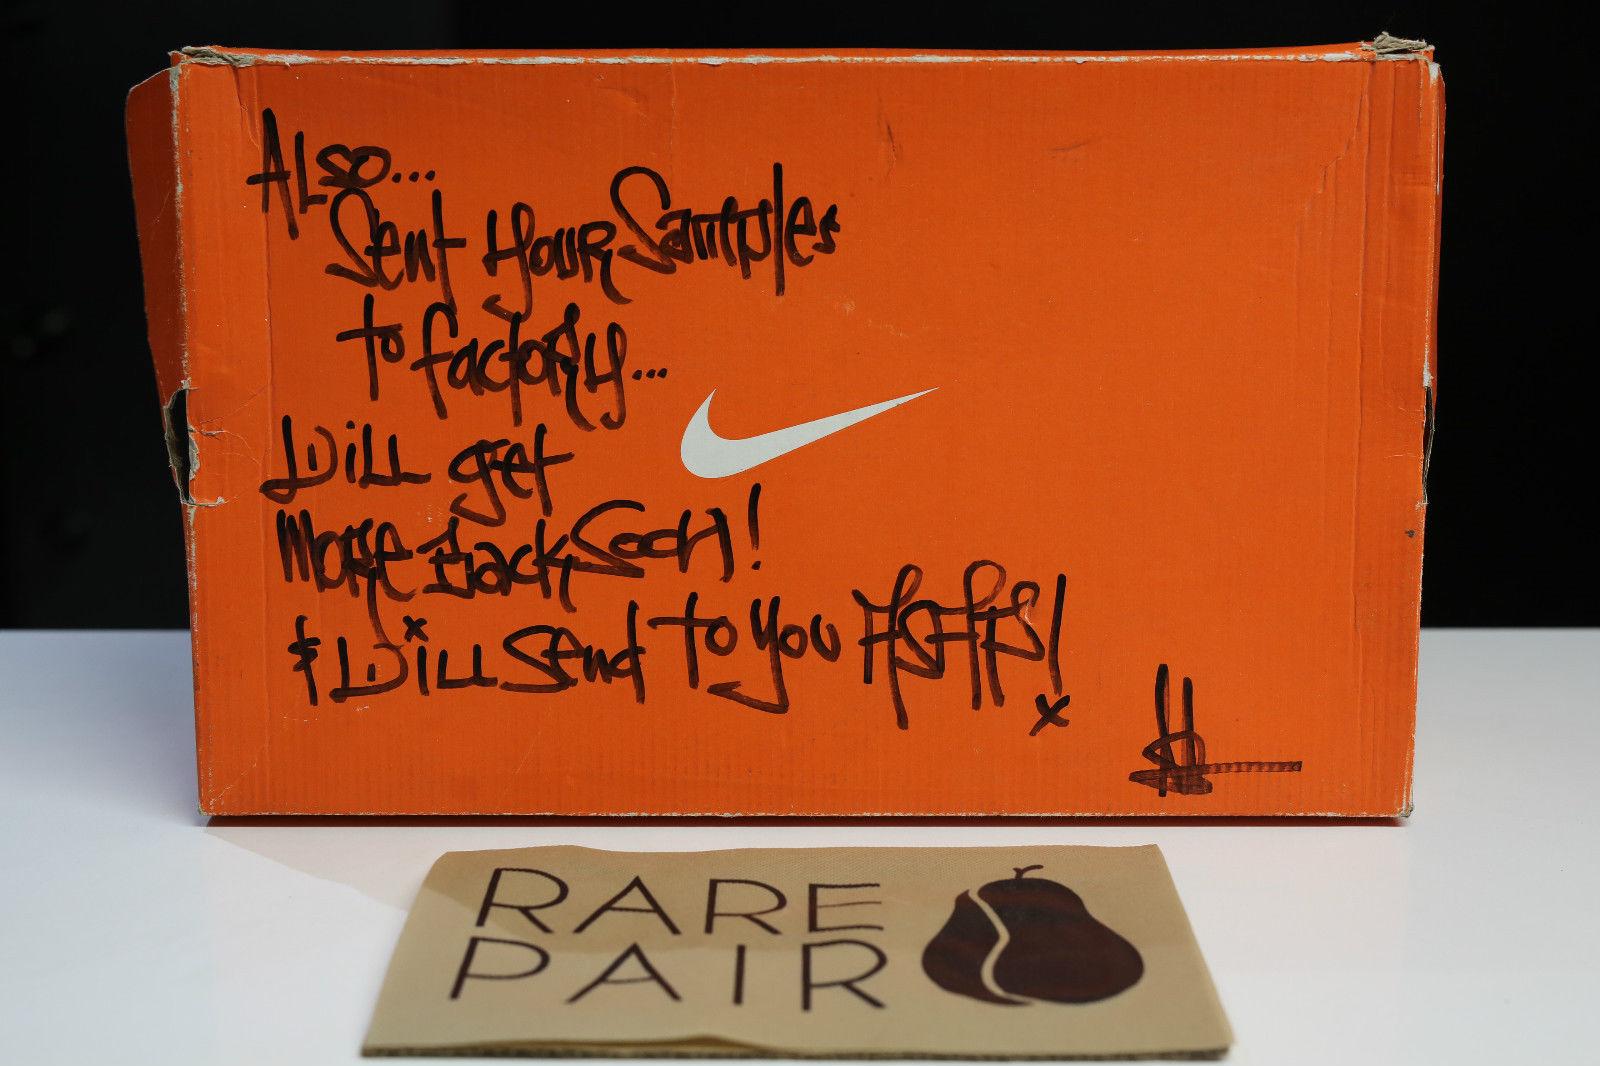 Nike Air Yeezy Kanye West Black/White Sample Pair Box